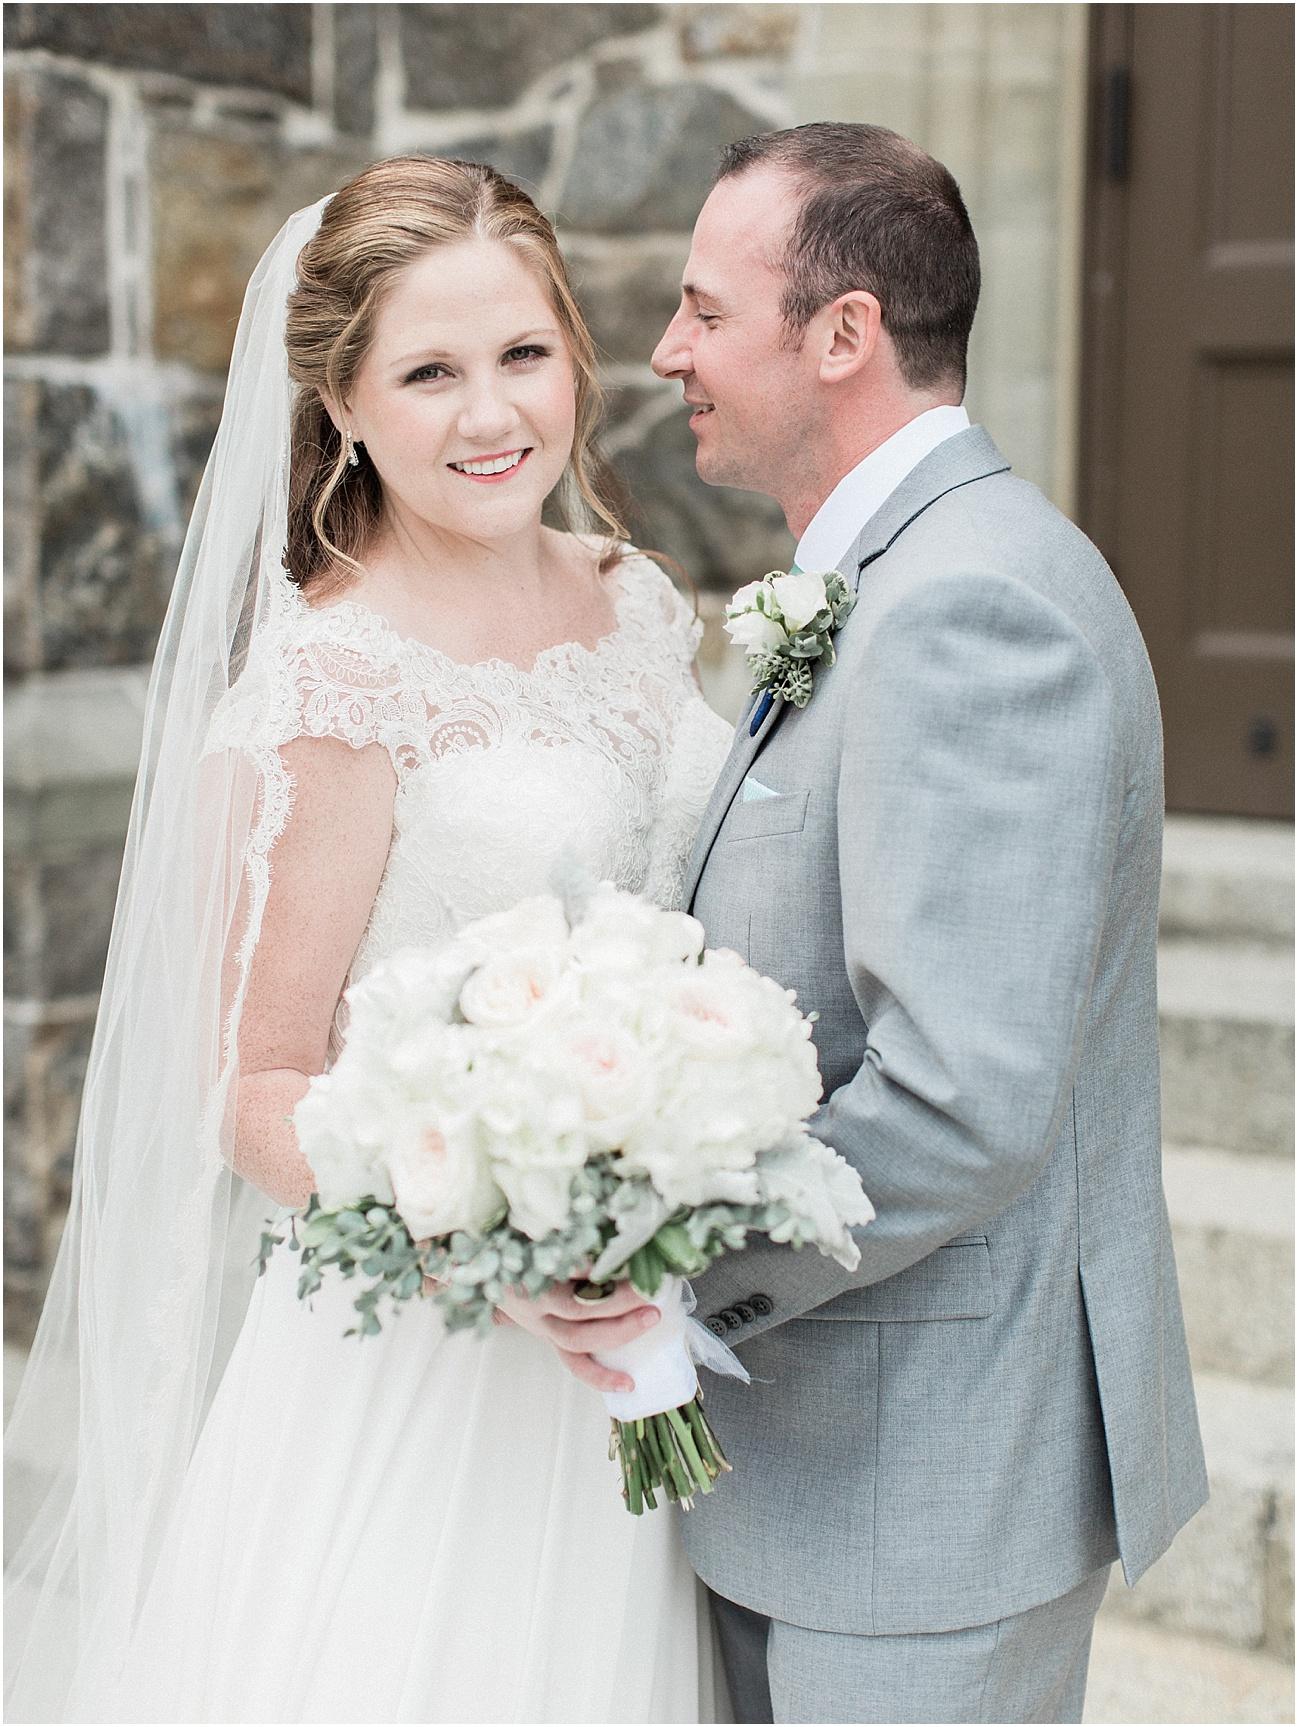 jaclyn_adam_st_ann_brendans_dorchester_southie_castle_bride_groom_venezia_waterfront__cape_cod_boston_wedding_photographer_meredith_jane_photography_photo_0916.jpg